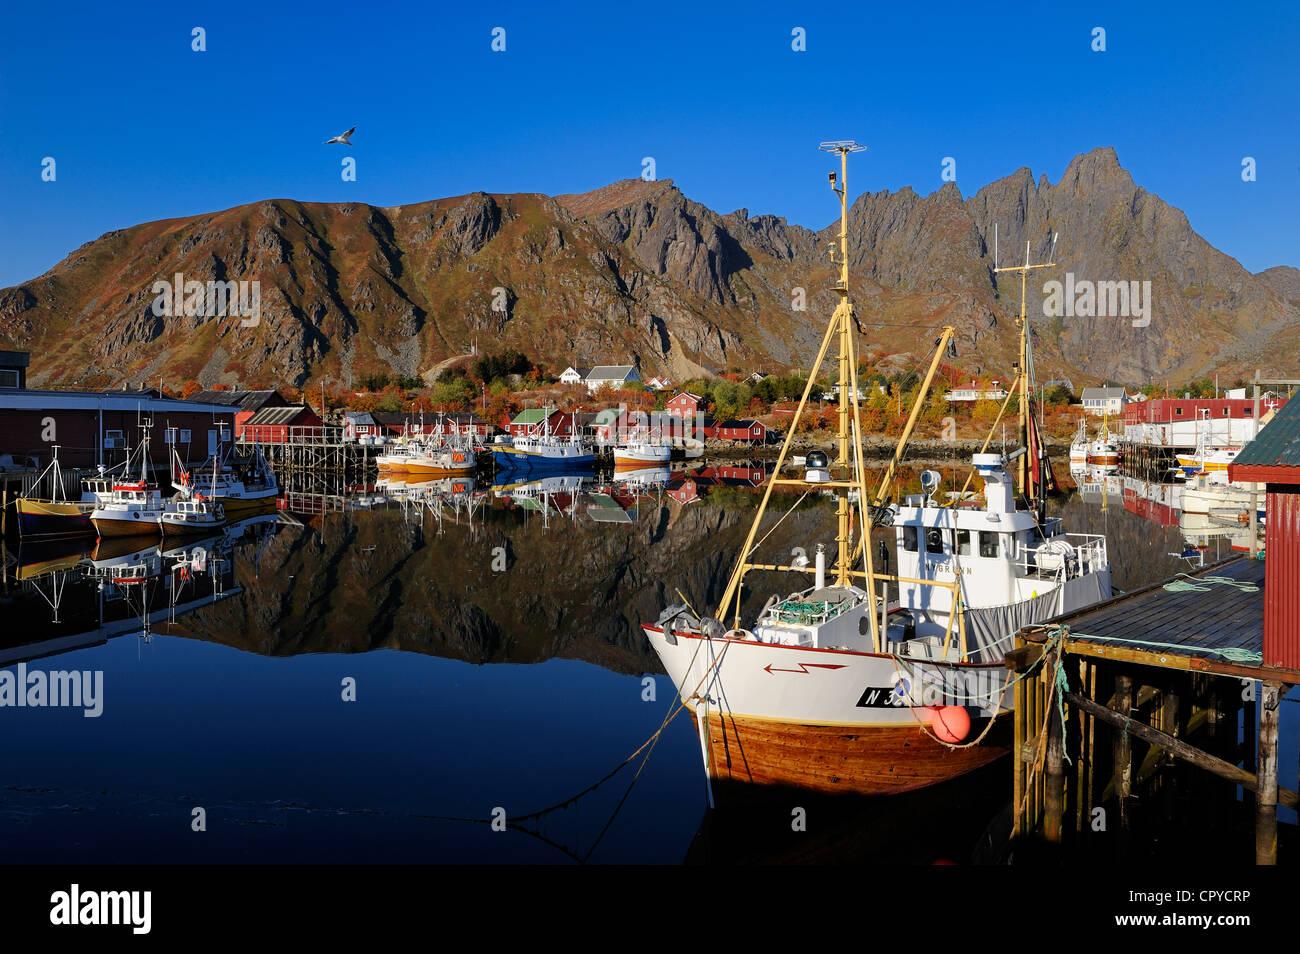 Norway, Nordland County, Lofoten Islands, Vestvagoy Island, Ballstad fishing harbour - Stock Image